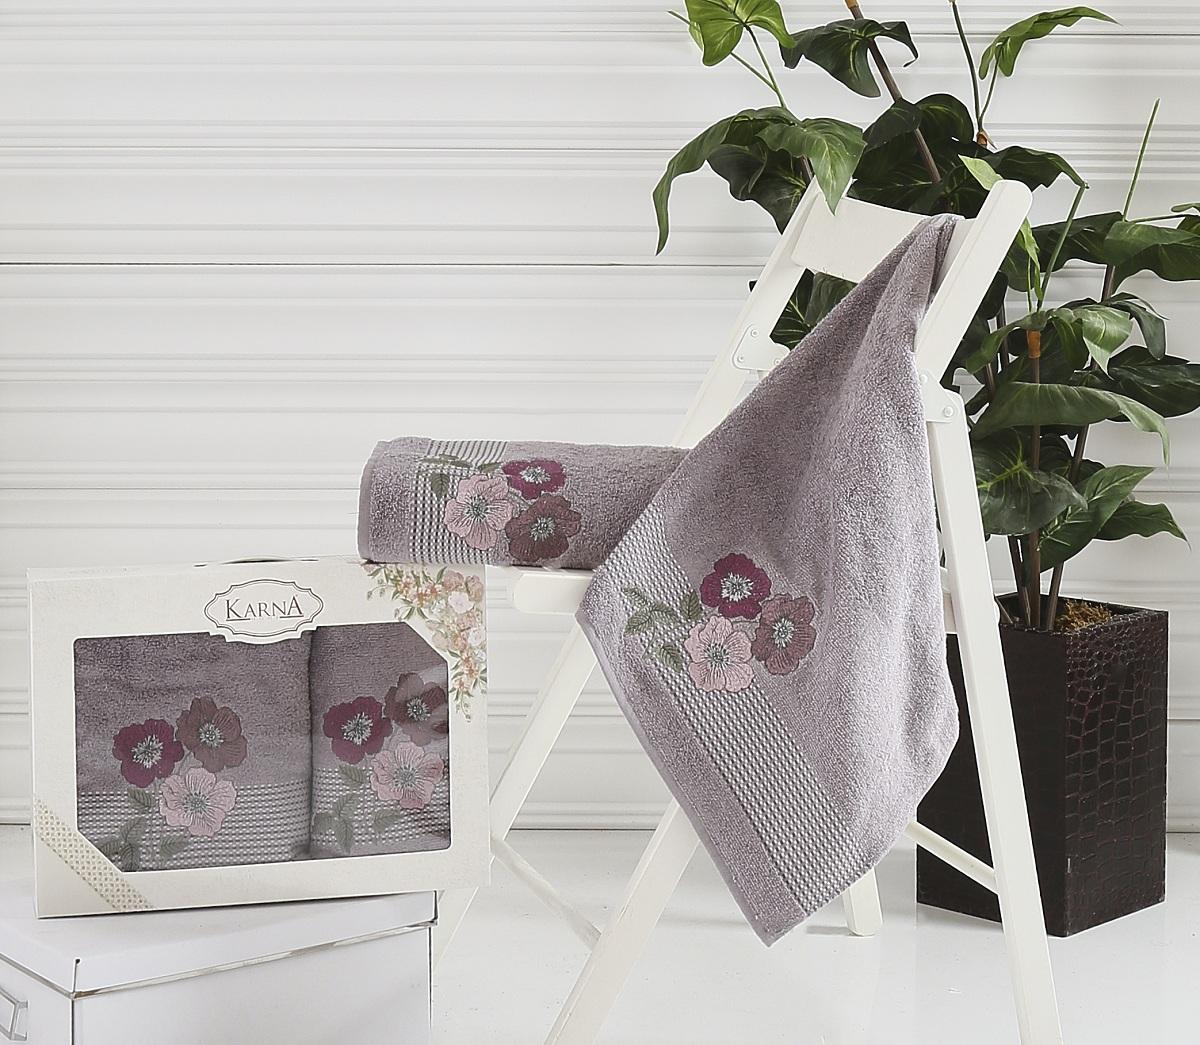 Набор полотенец Karna Sandy, цвет: темно-серый, 50 х 90 см, 70 х 140 см, 2 шт2390/CHAR006